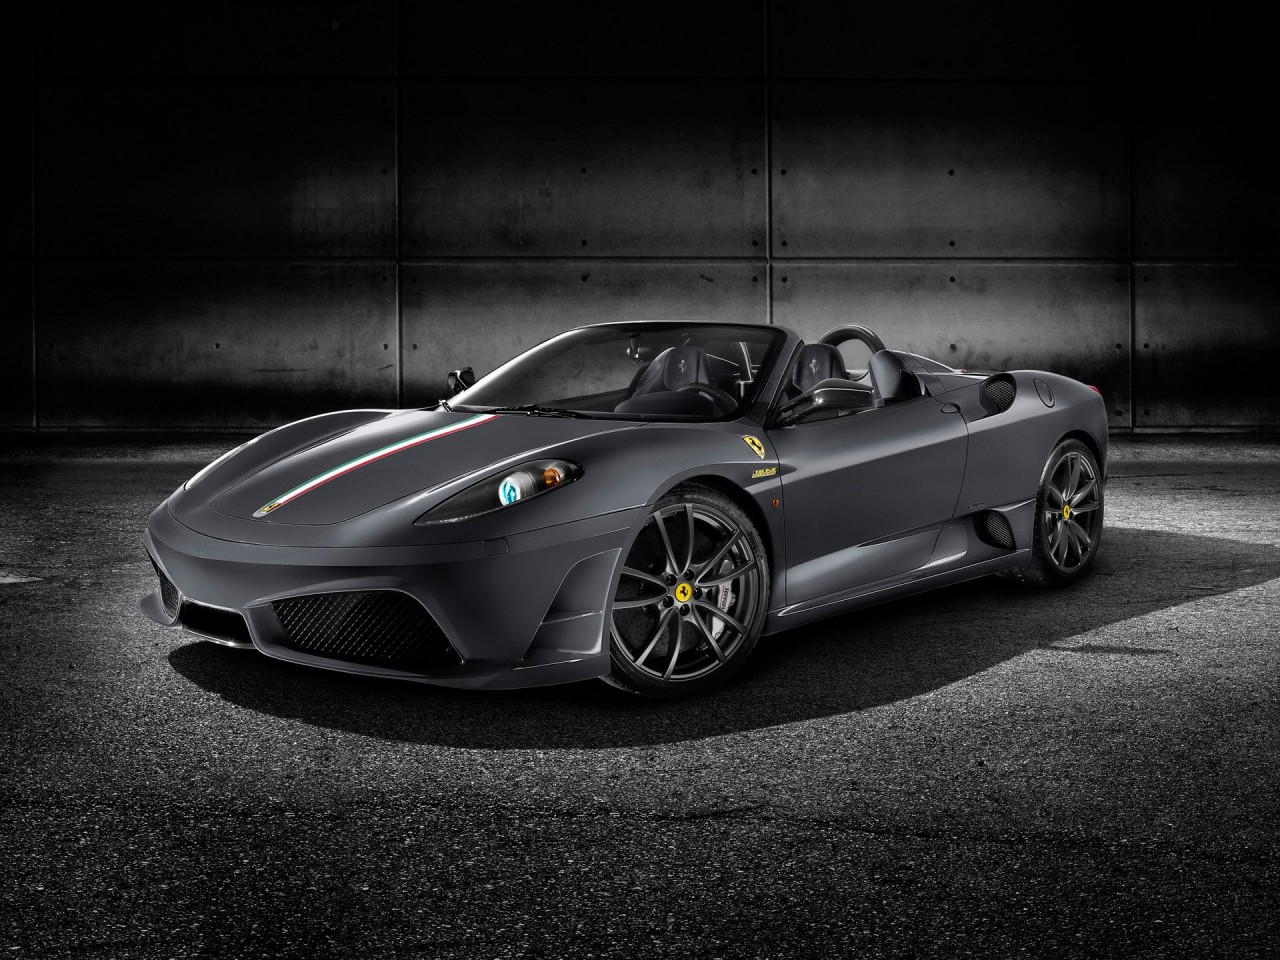 Ferrari f1 0 to 100 mph